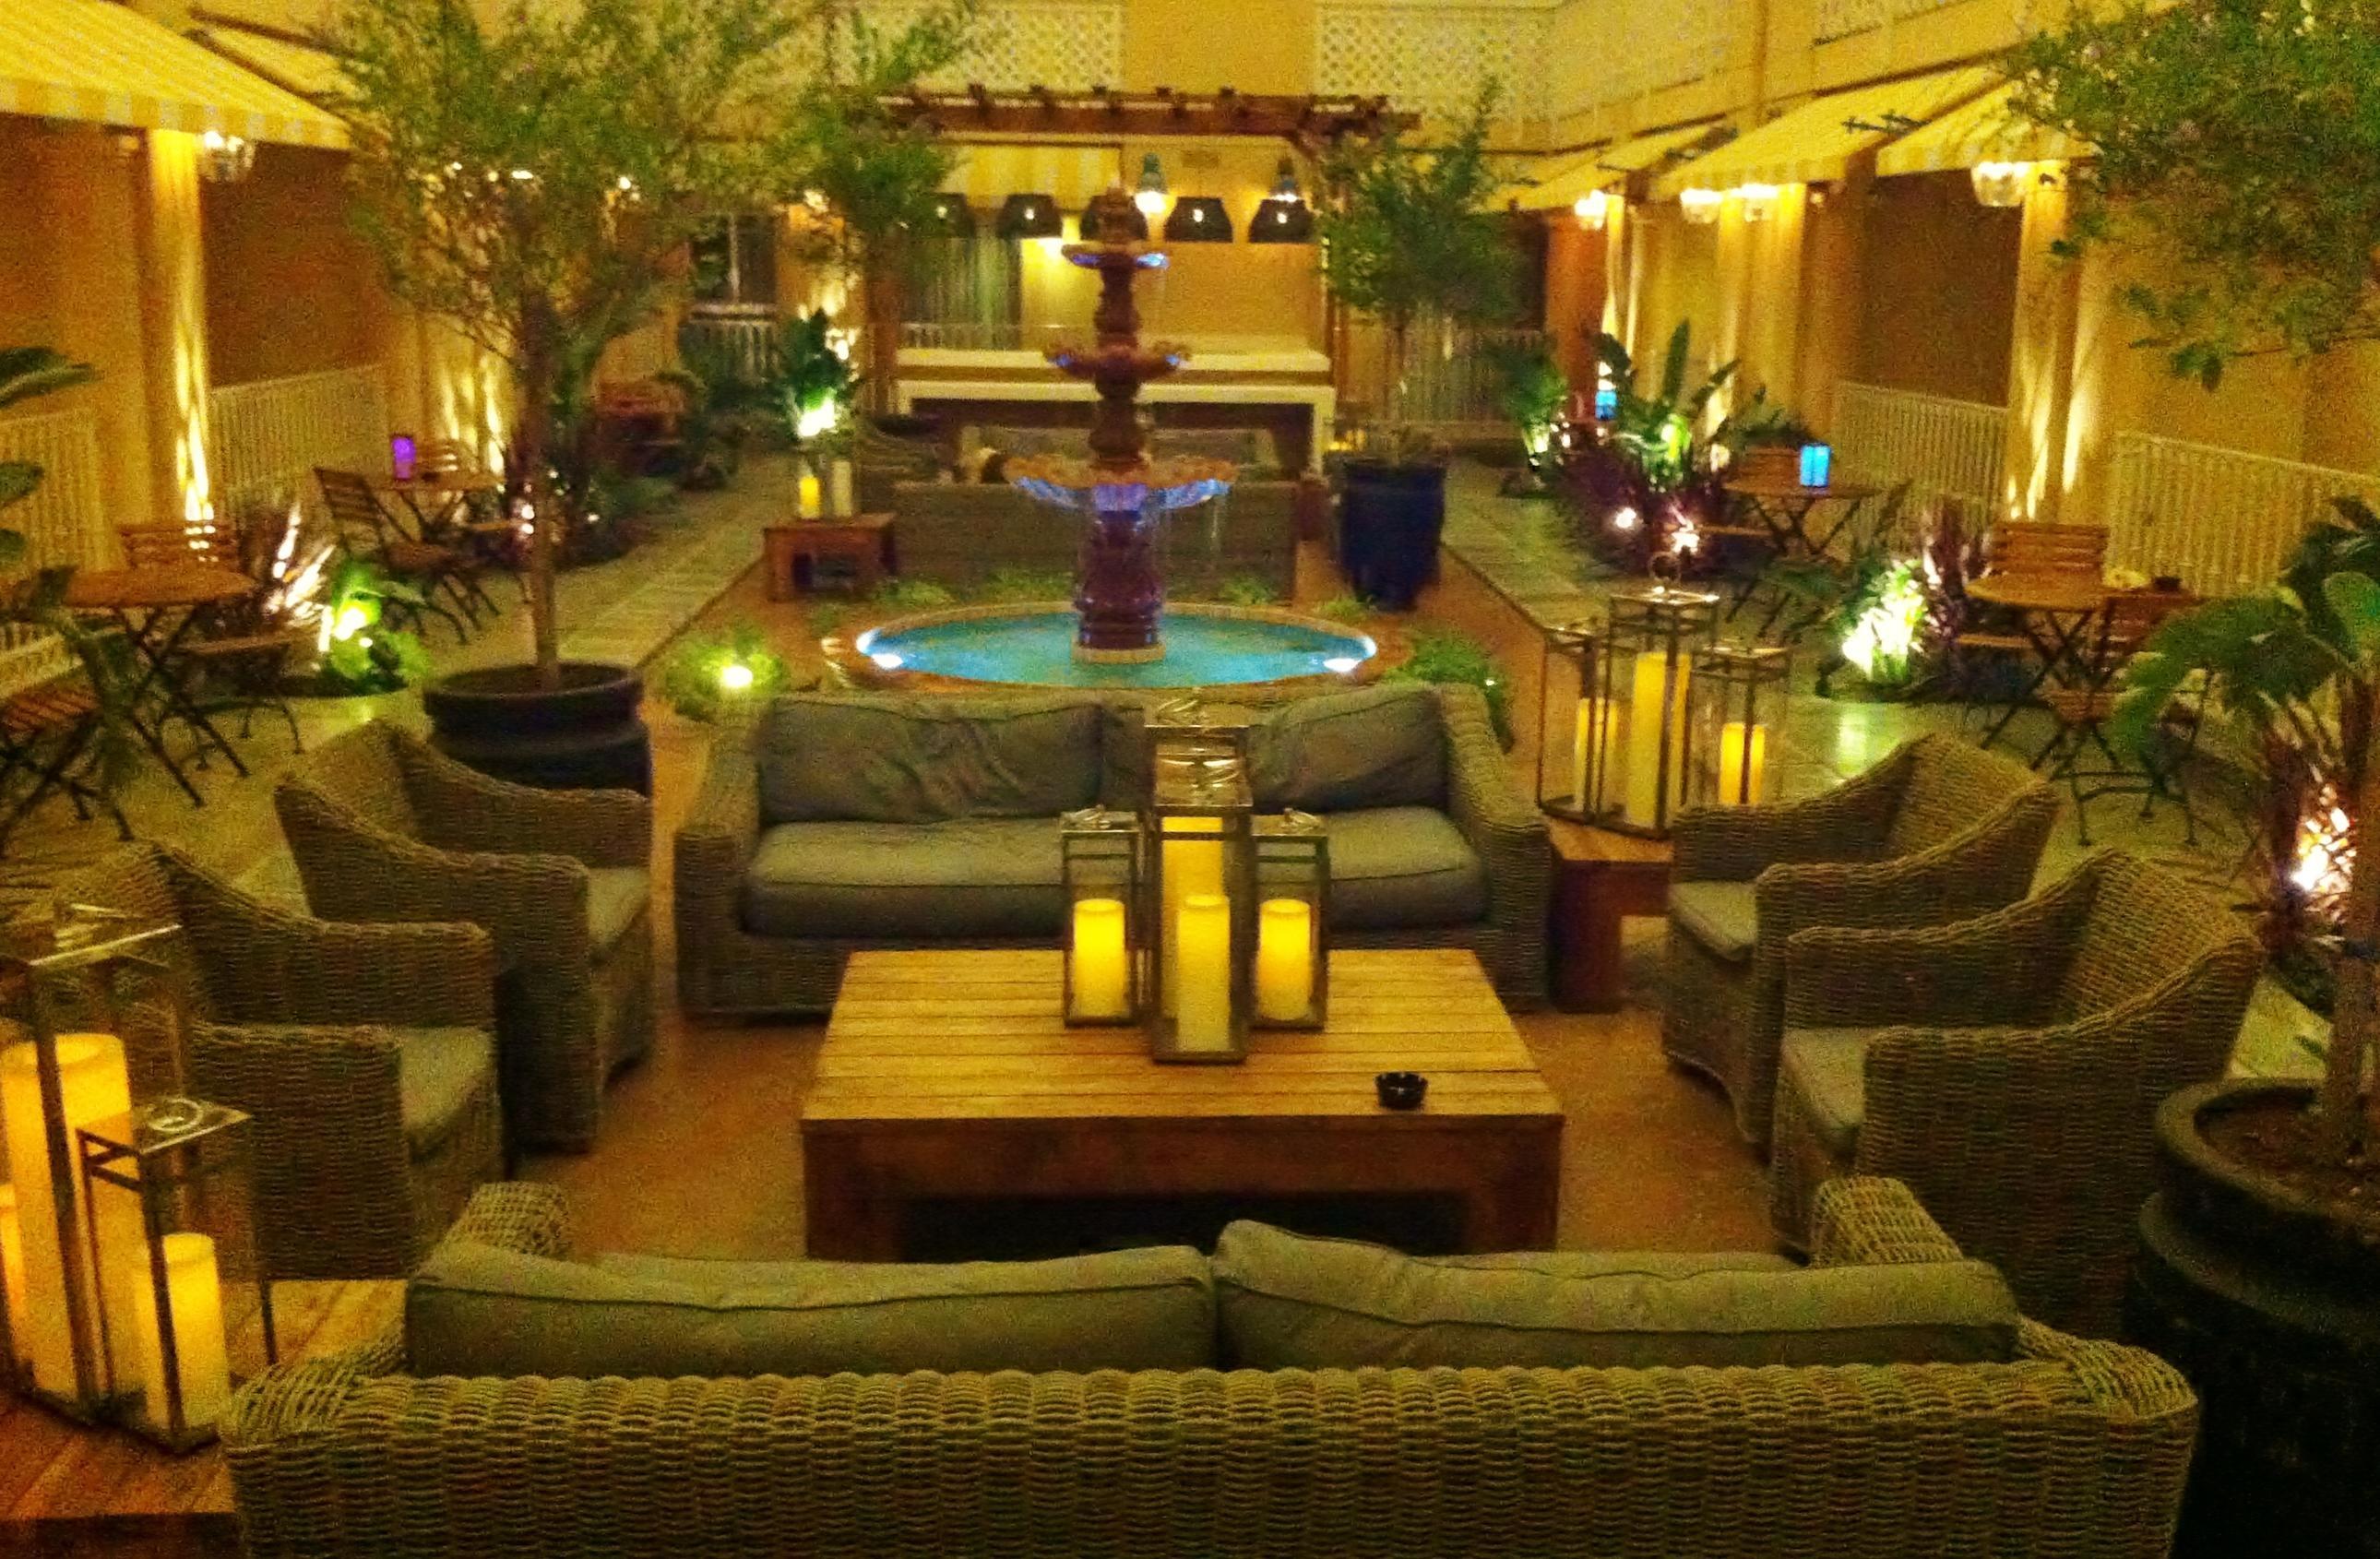 Hollywood hotel in los angeles ca 90029 for Snooty fox motor inn